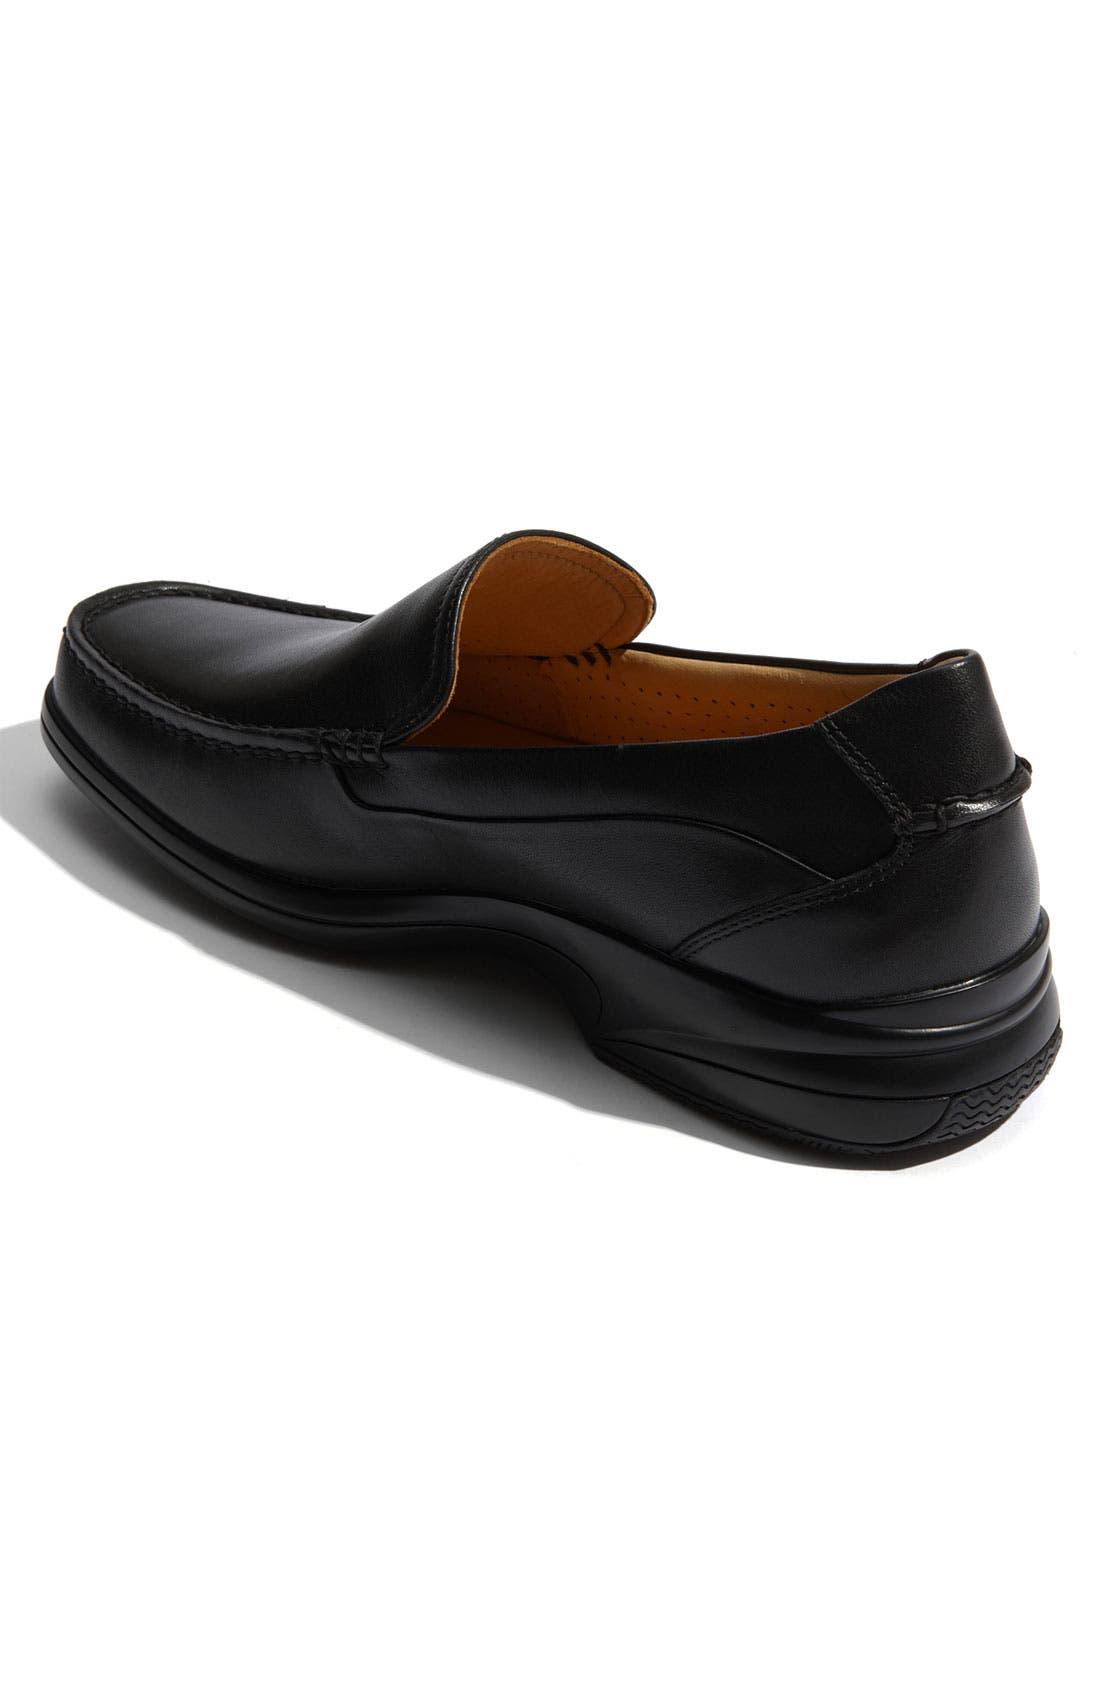 Alternate Image 2  - Sperry Top-Sider® 'Gold ASV Venetian' Loafer (Men)